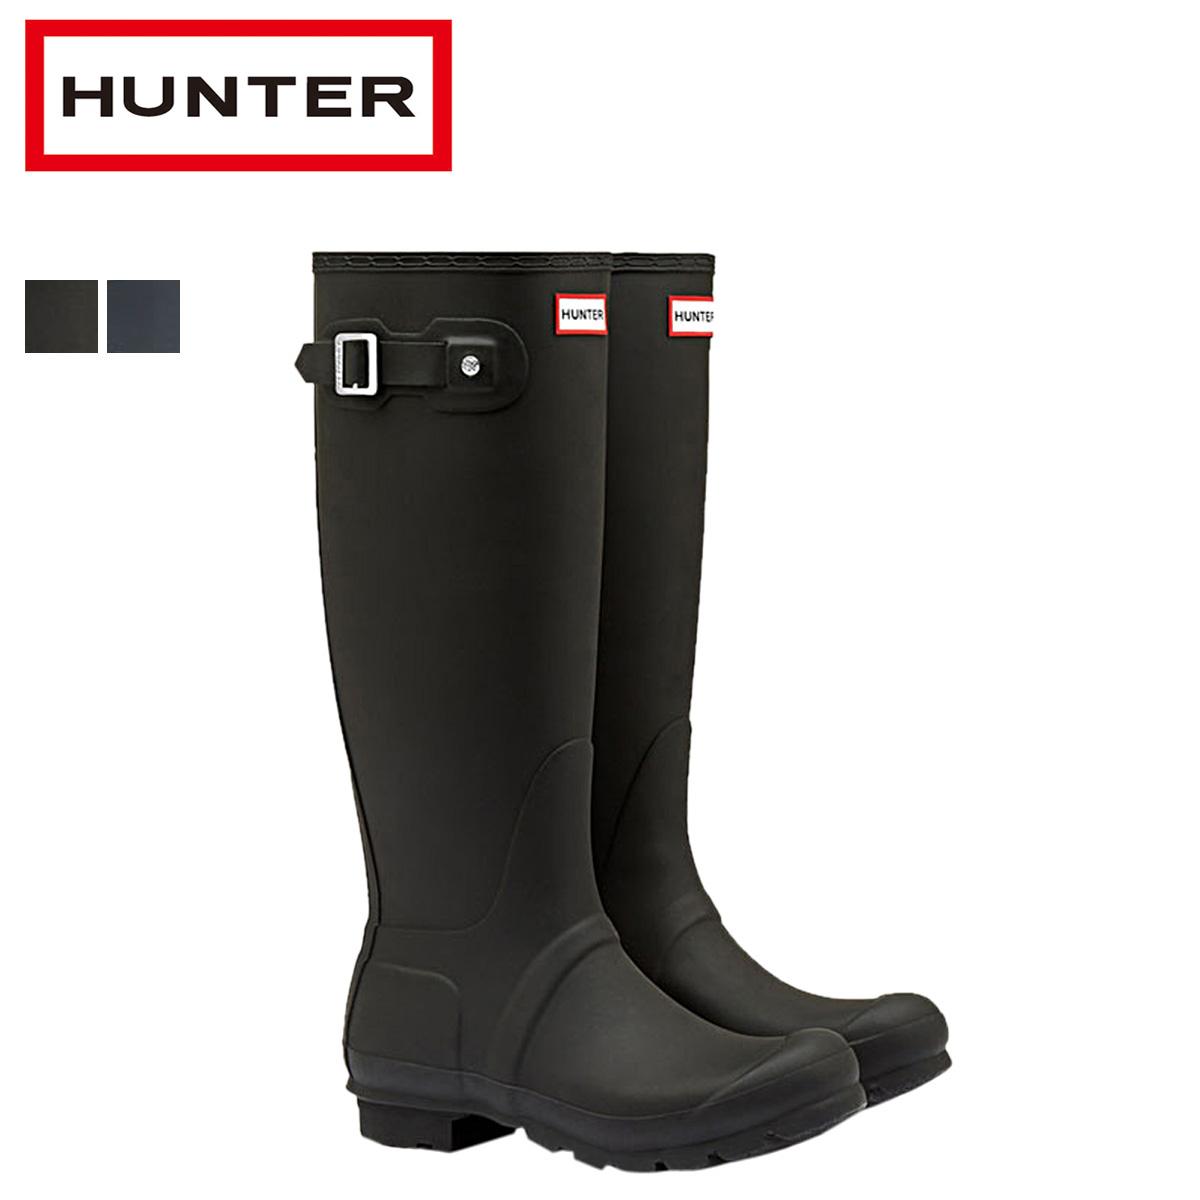 Sugar Online Shop | Rakuten Global Market: Hunter rain boots Lady\'s ...